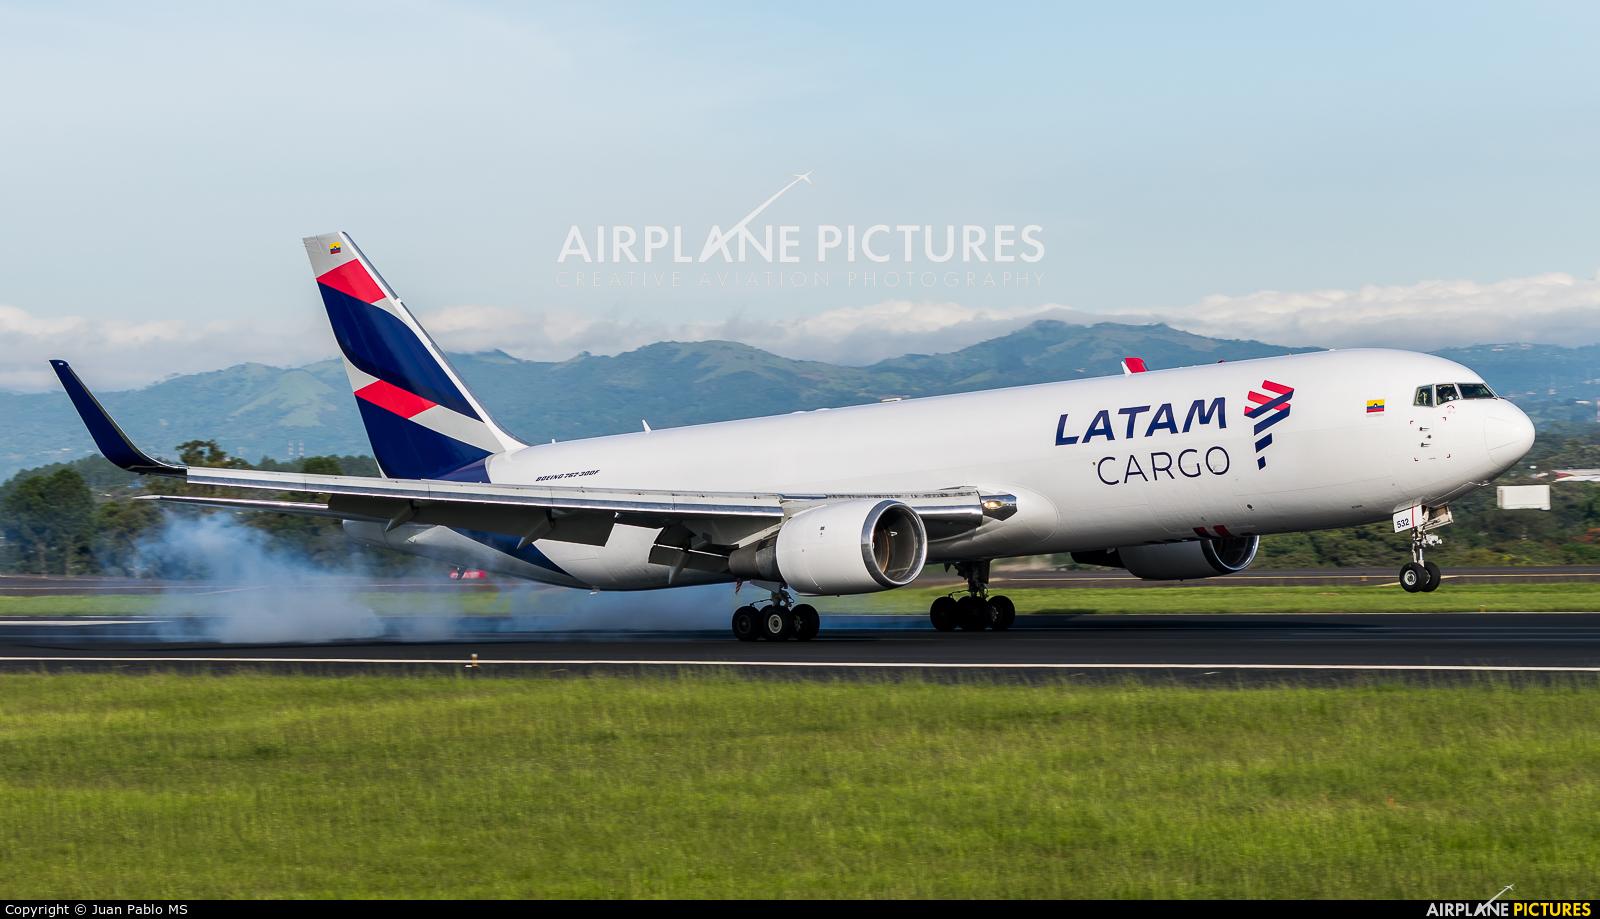 LATAM Cargo N532LA aircraft at San Jose - Juan Santamaría Intl